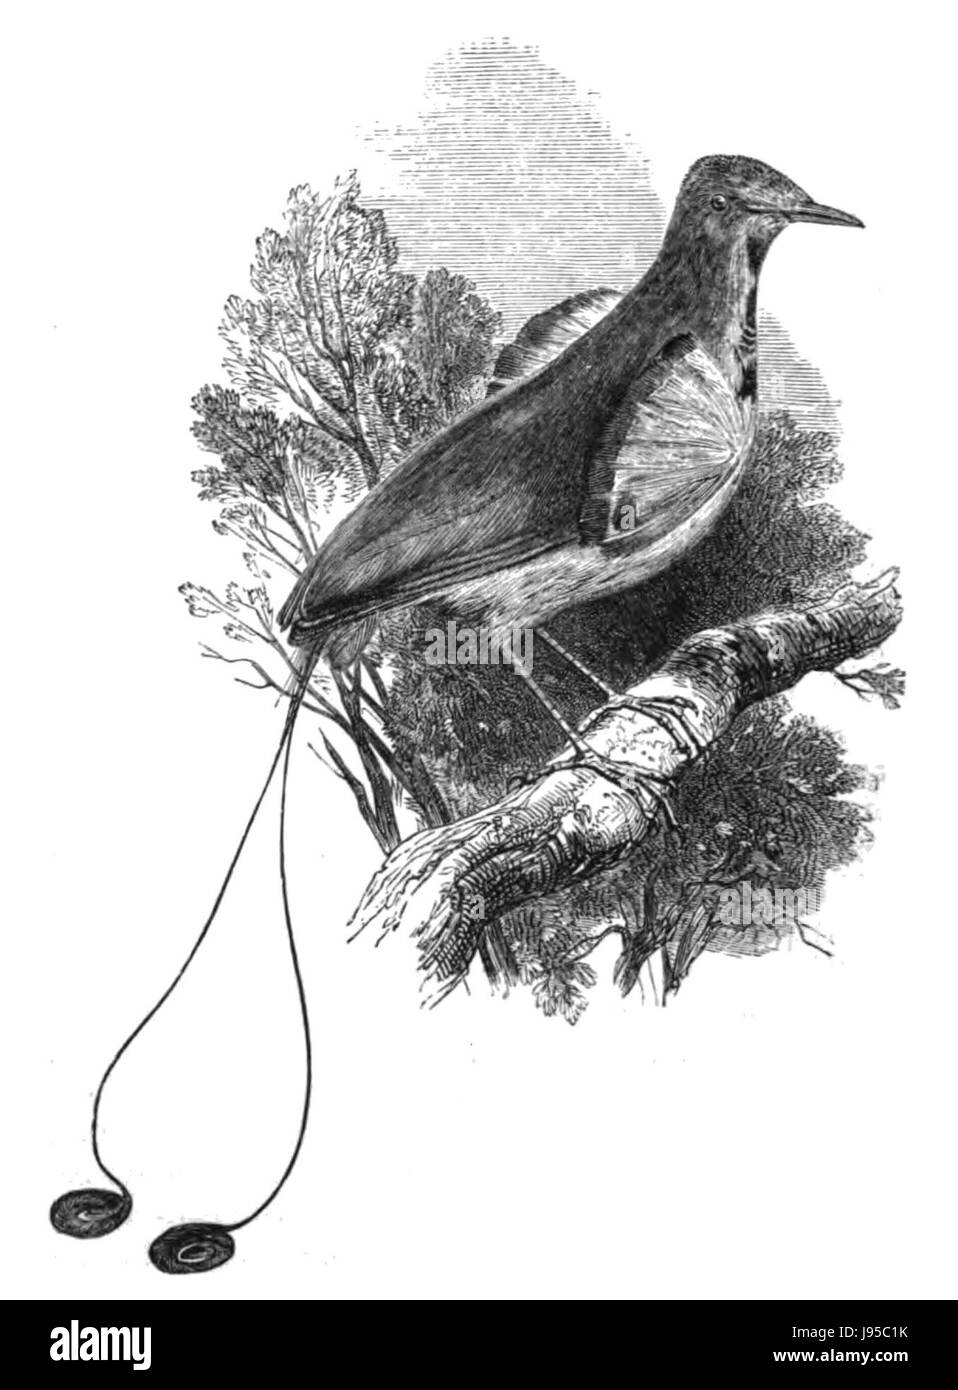 Natural History, Birds   Manucode - Stock Image